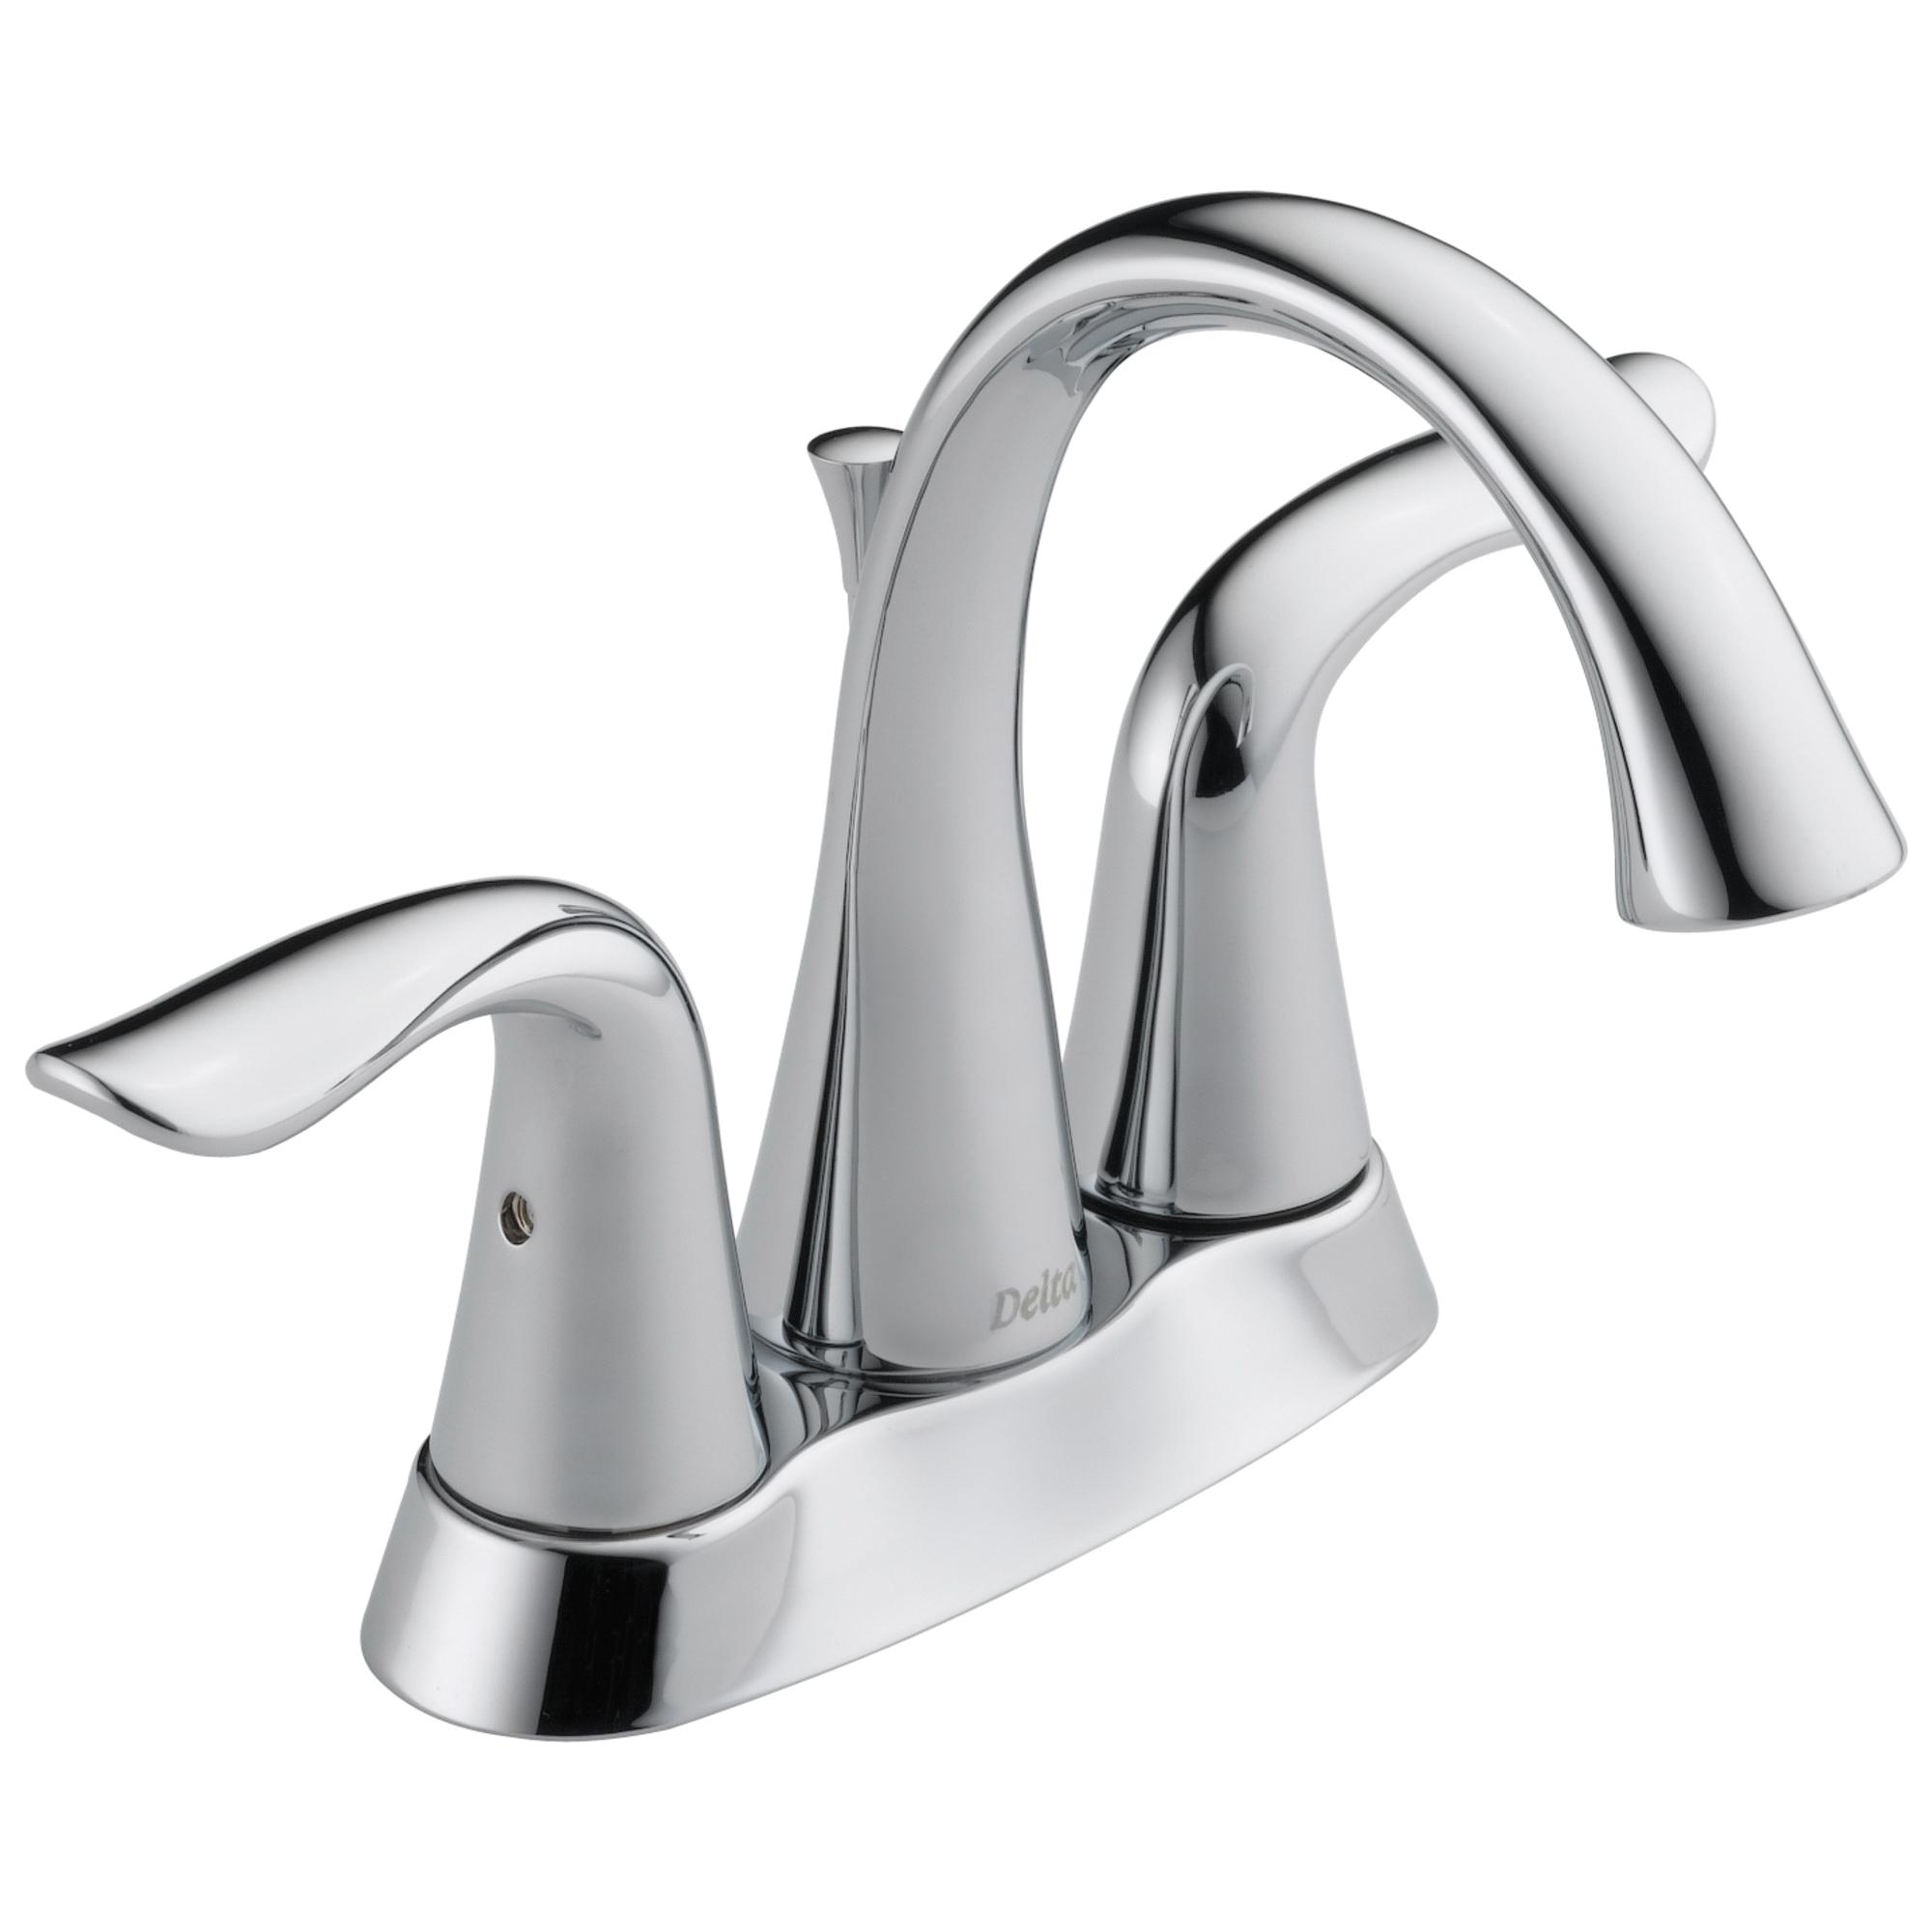 DELTA® 2538-MPU-DST Centerset Lavatory Faucet, Lahara®, Chrome Plated, 2 Handles, Metal Pop-Up Drain, 1.2 gpm